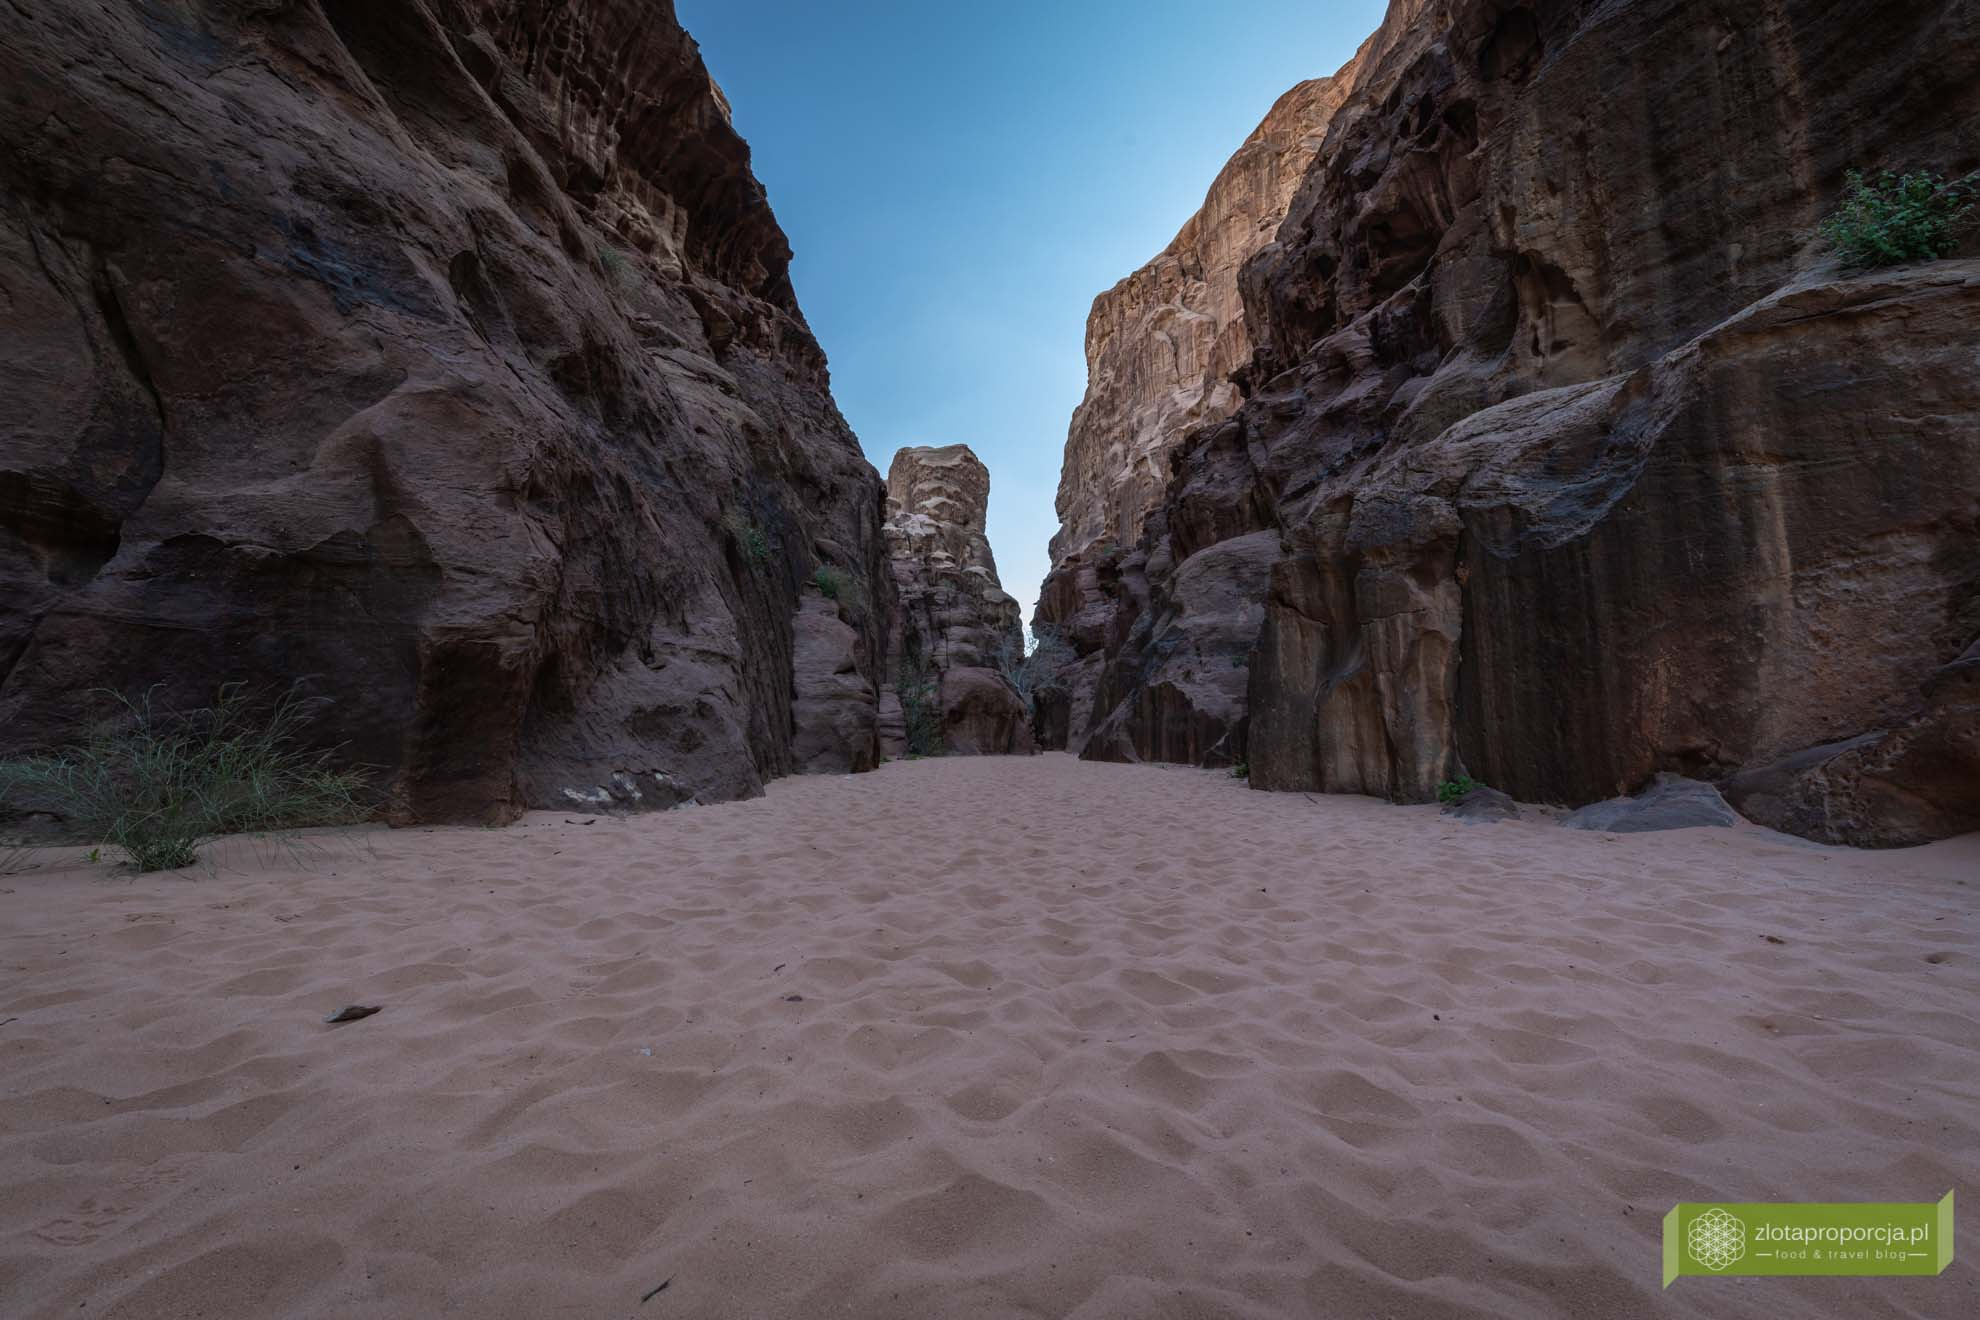 Wadi Rum, pustynia Wadi Rum, Jordania, pustynia Jordania; Wadi rum wycieczka, Wadi Rum zwiedzanie, Jordania atrakcje; Kanion Abu Khashaba, Kanion Wadi Rum;